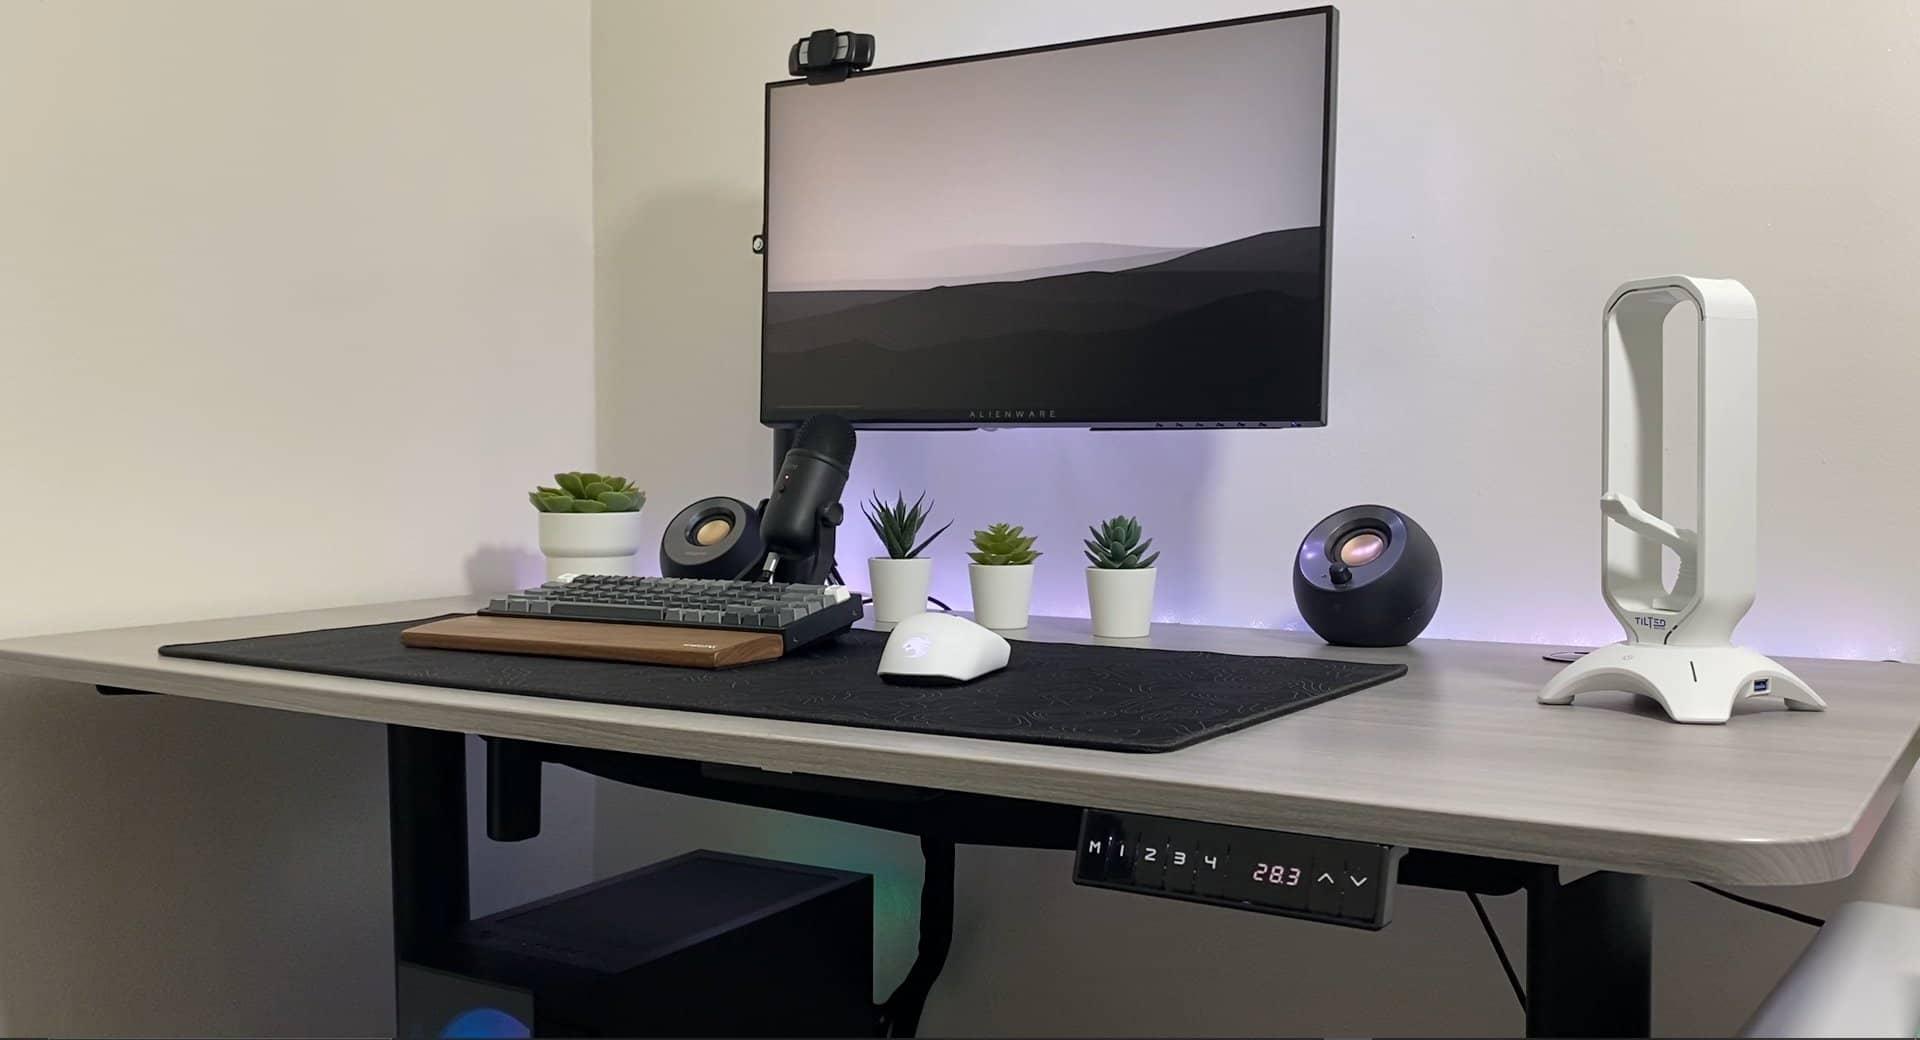 Apex Desk Elite vs Vortex standing desk review